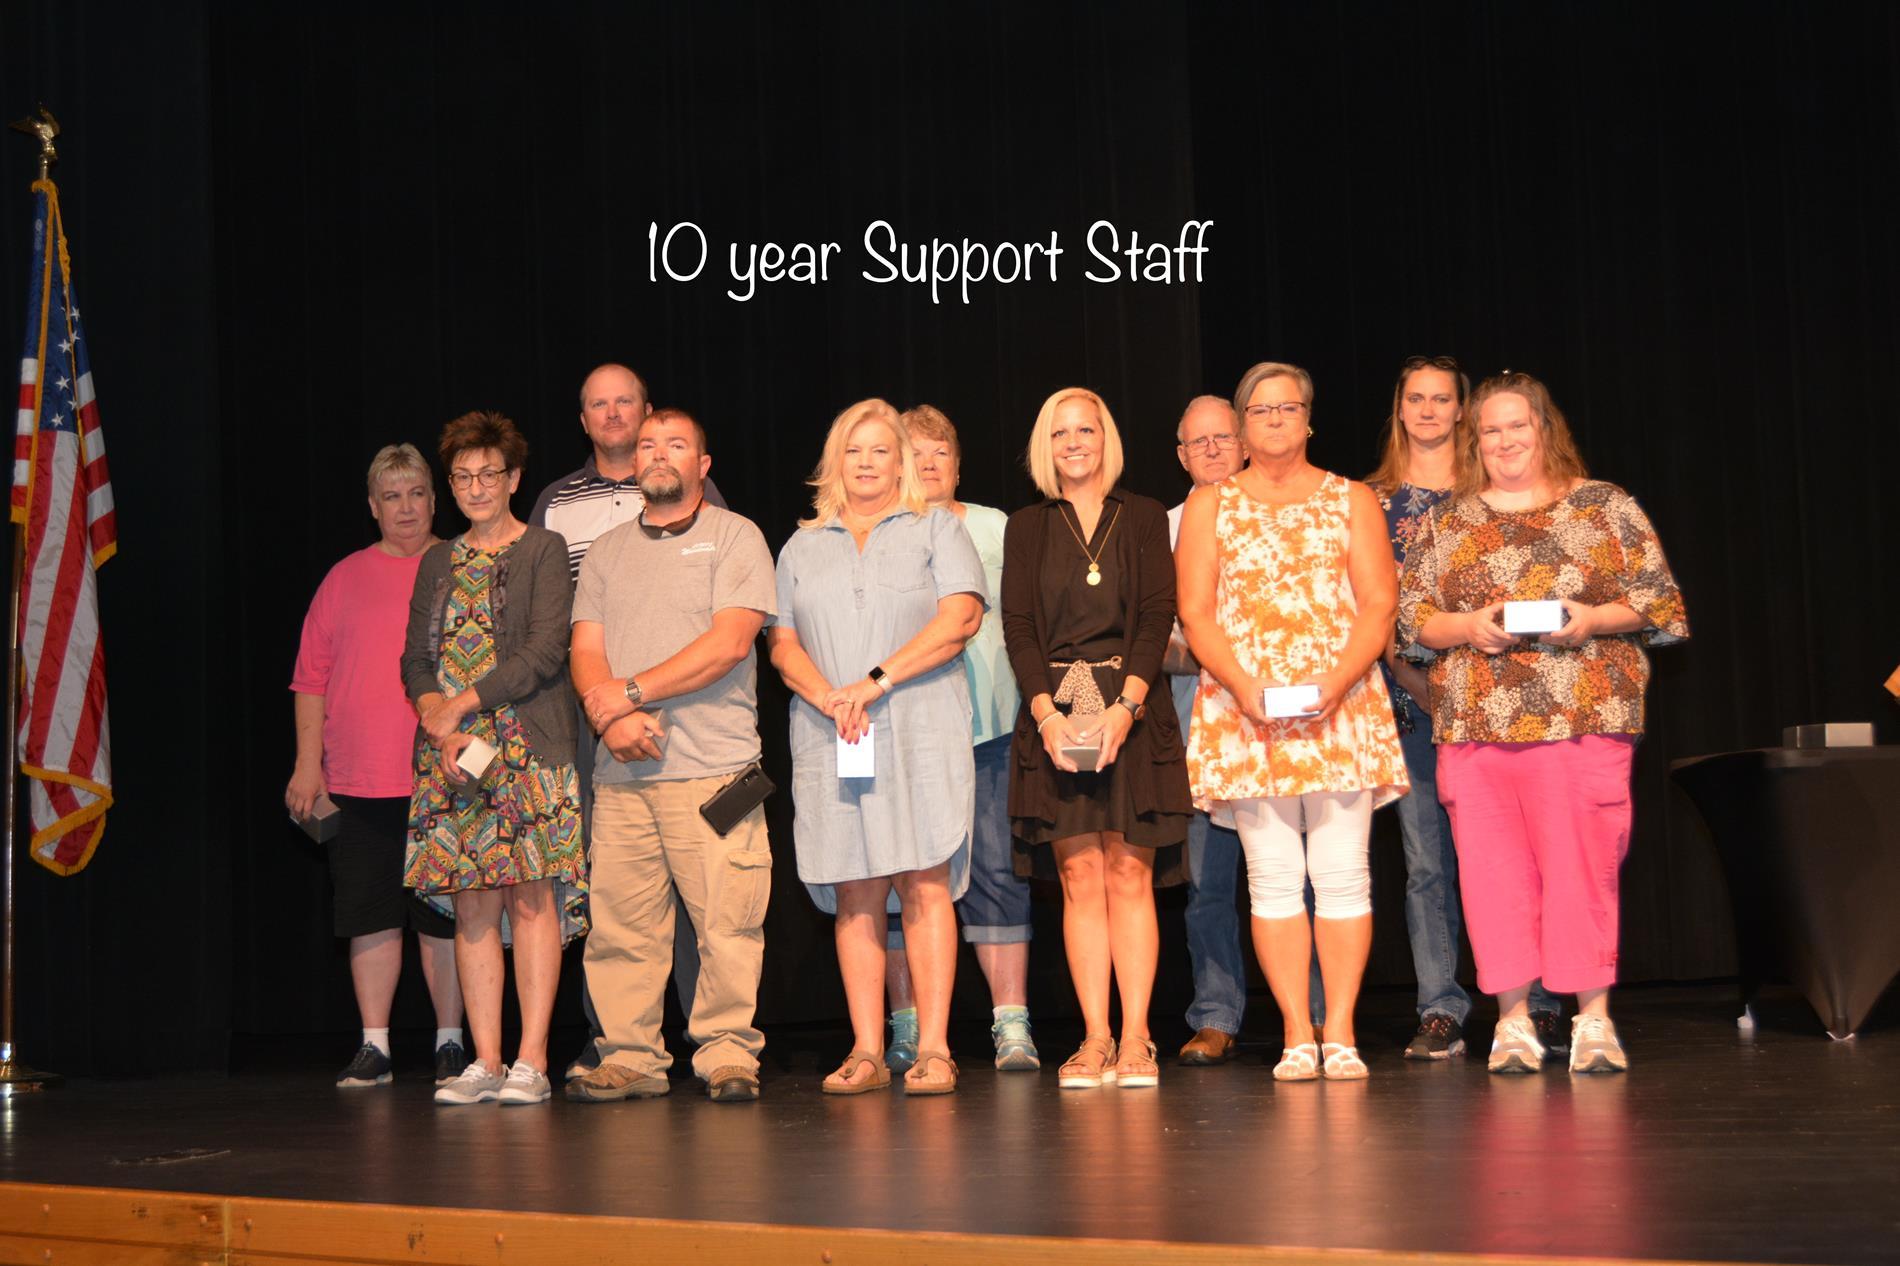 10 year Support staff